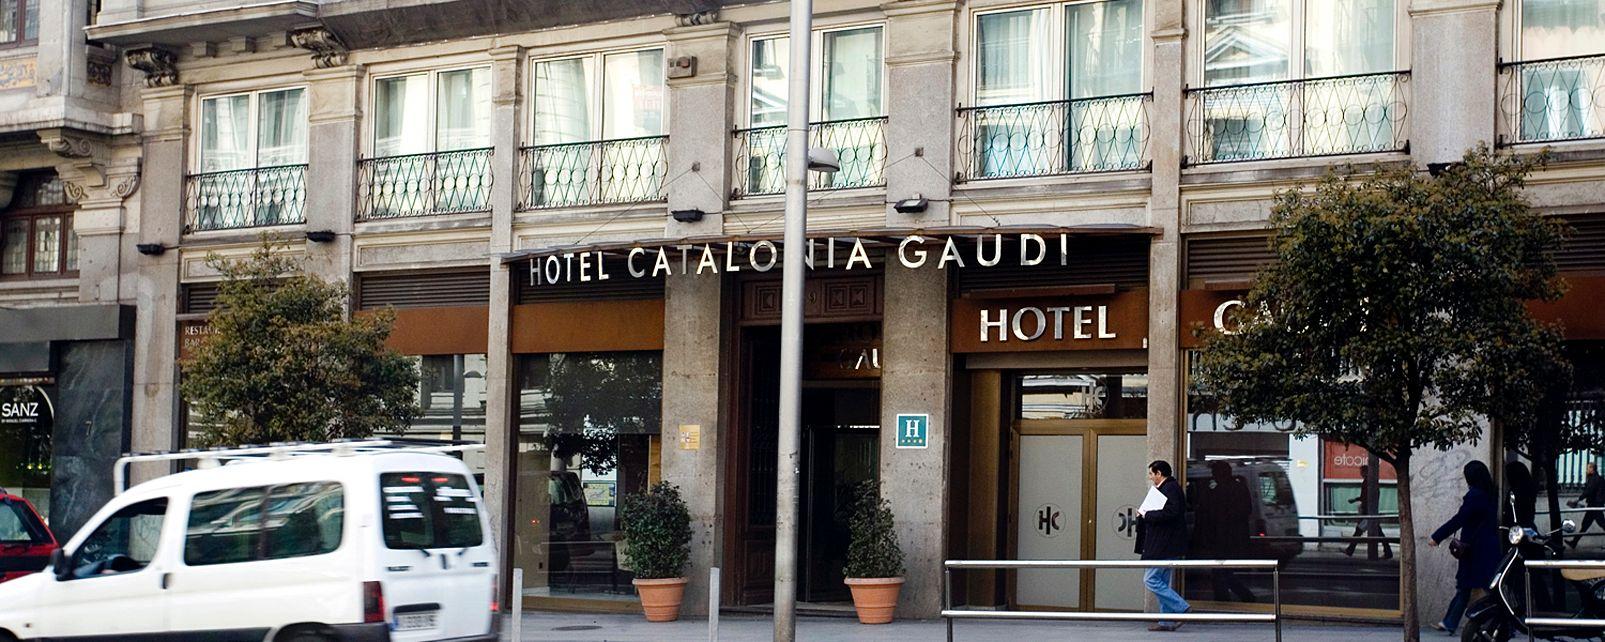 Hotel Catalonia Gaudí